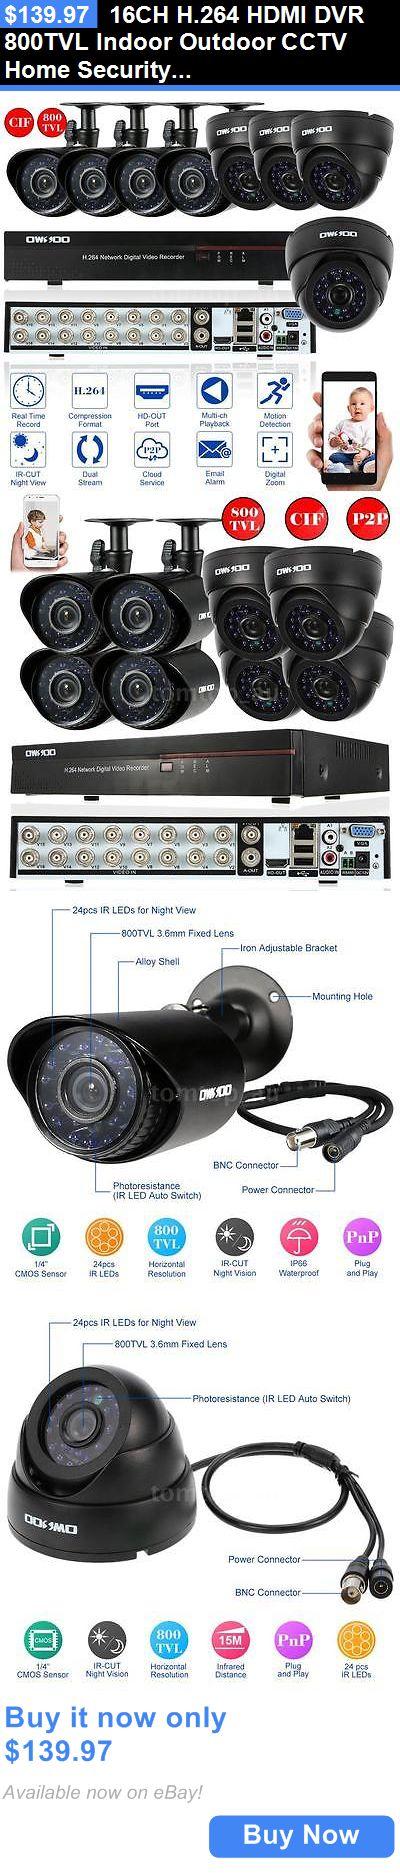 Surveillance Security Systems 16ch H 264 Hdmi Dvr 800tvl Indoor Outdoor Security Cameras For Home Wireless Home Security Systems Home Security Camera Systems